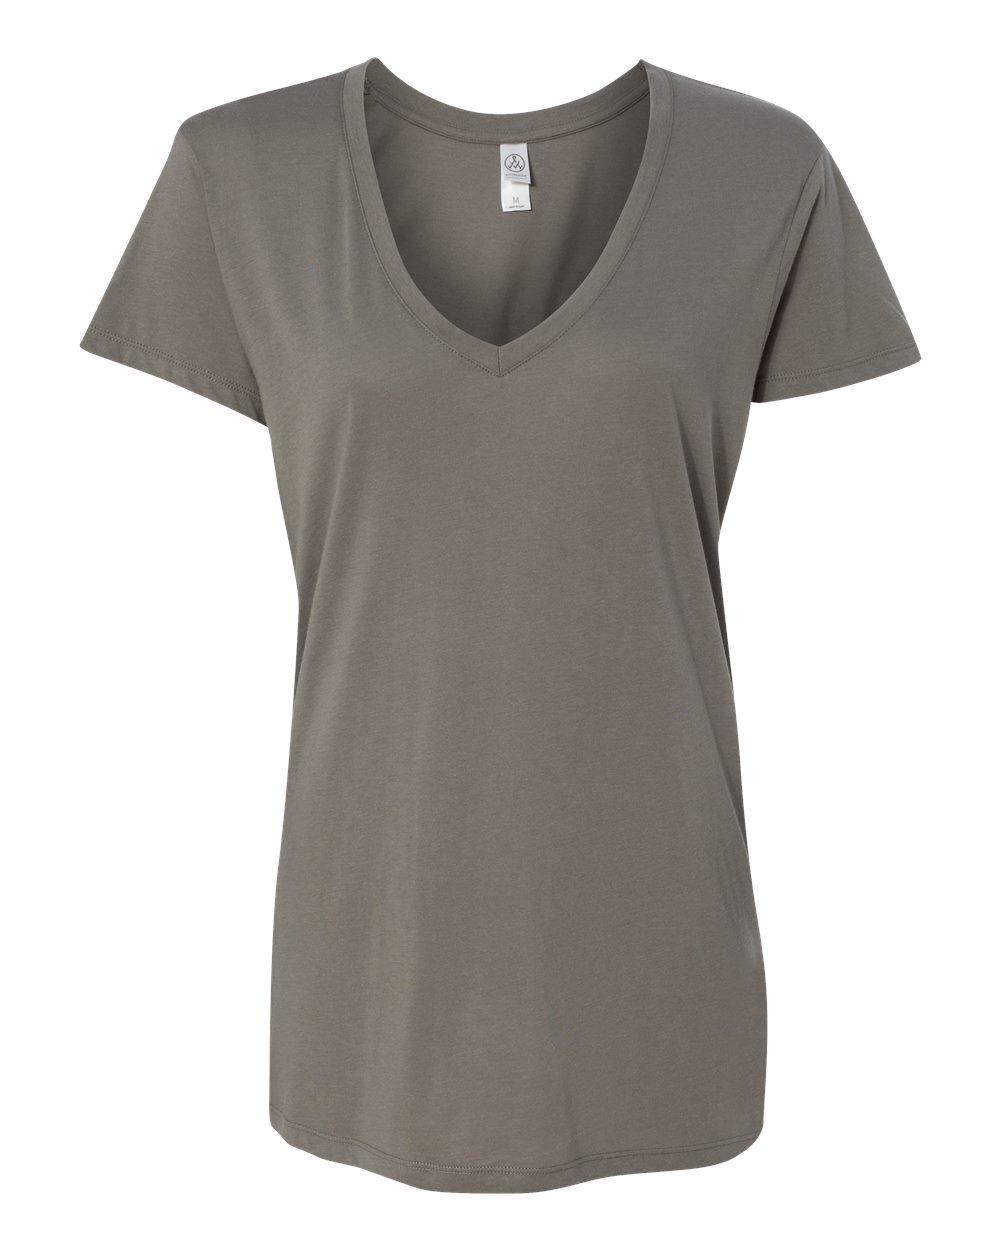 8ce691c1 Custom Juniors V-Neck T-Shirts - No Minimum